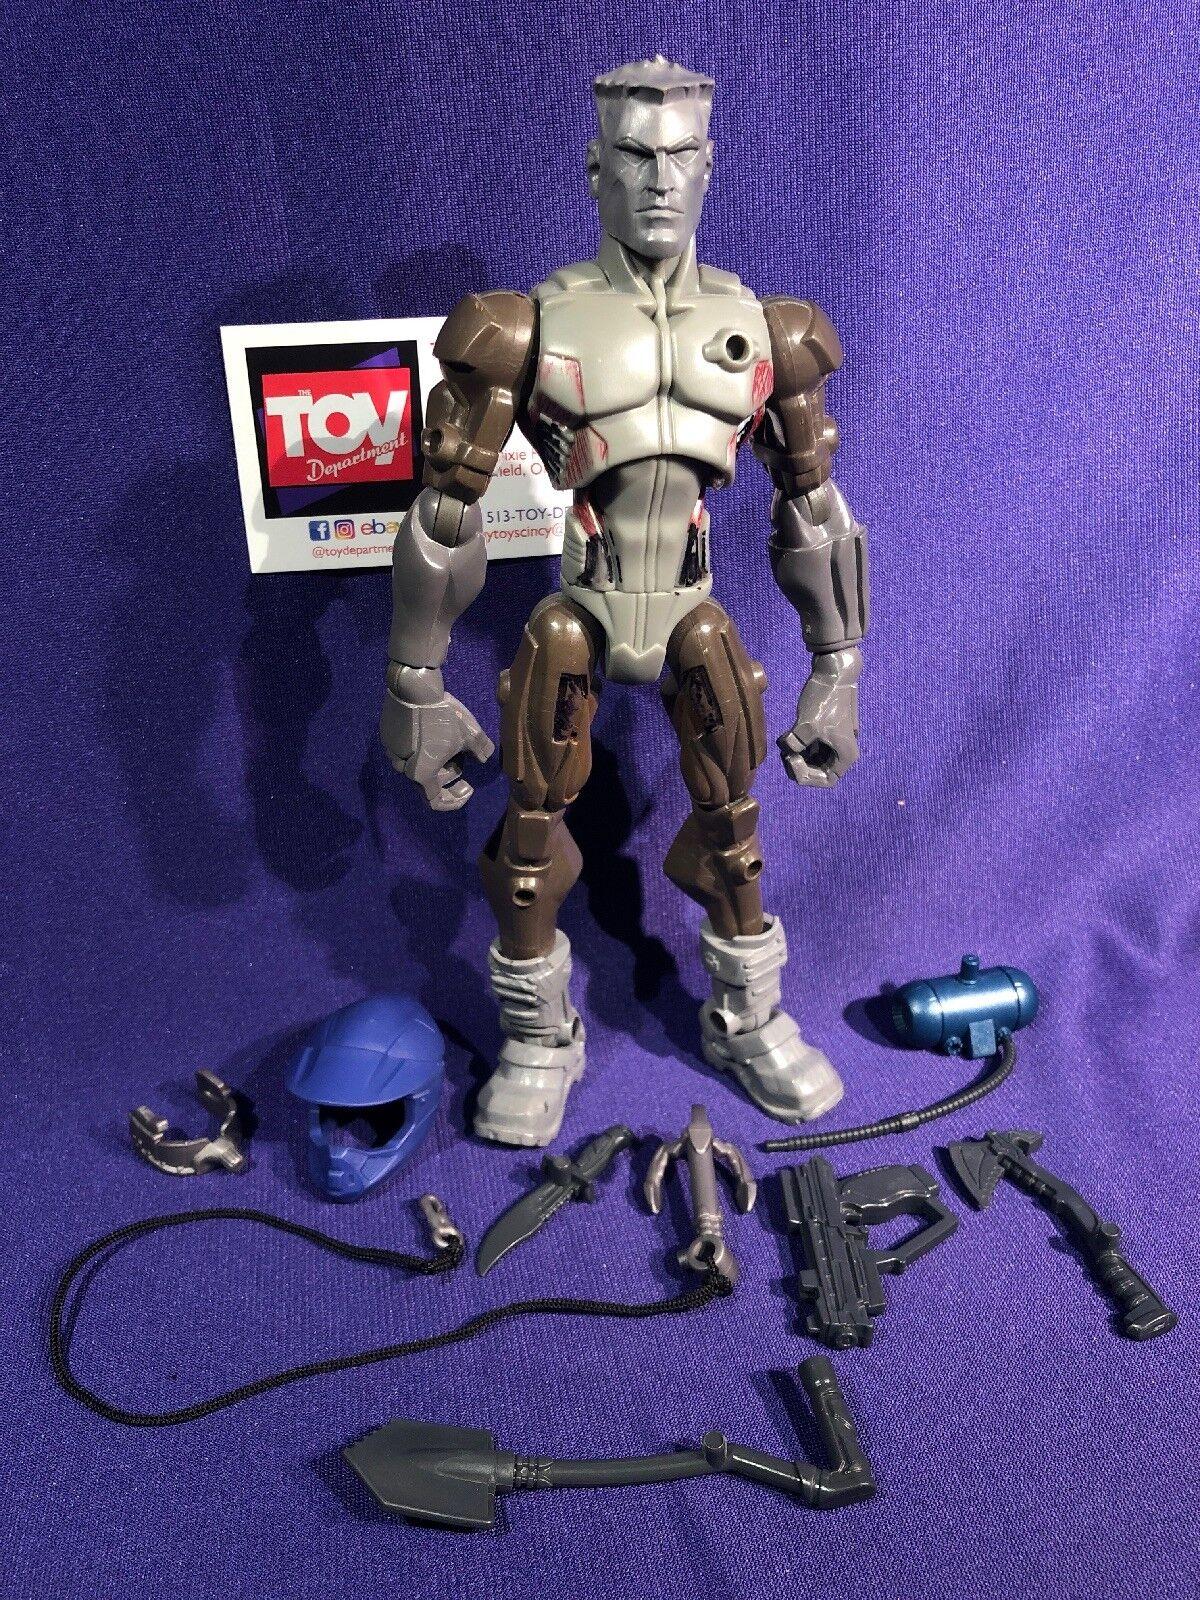 Hasbro Gi Joe Sigma seis 6 noche Ranger Quad ATV Duque primer tiro Projootipo Figura